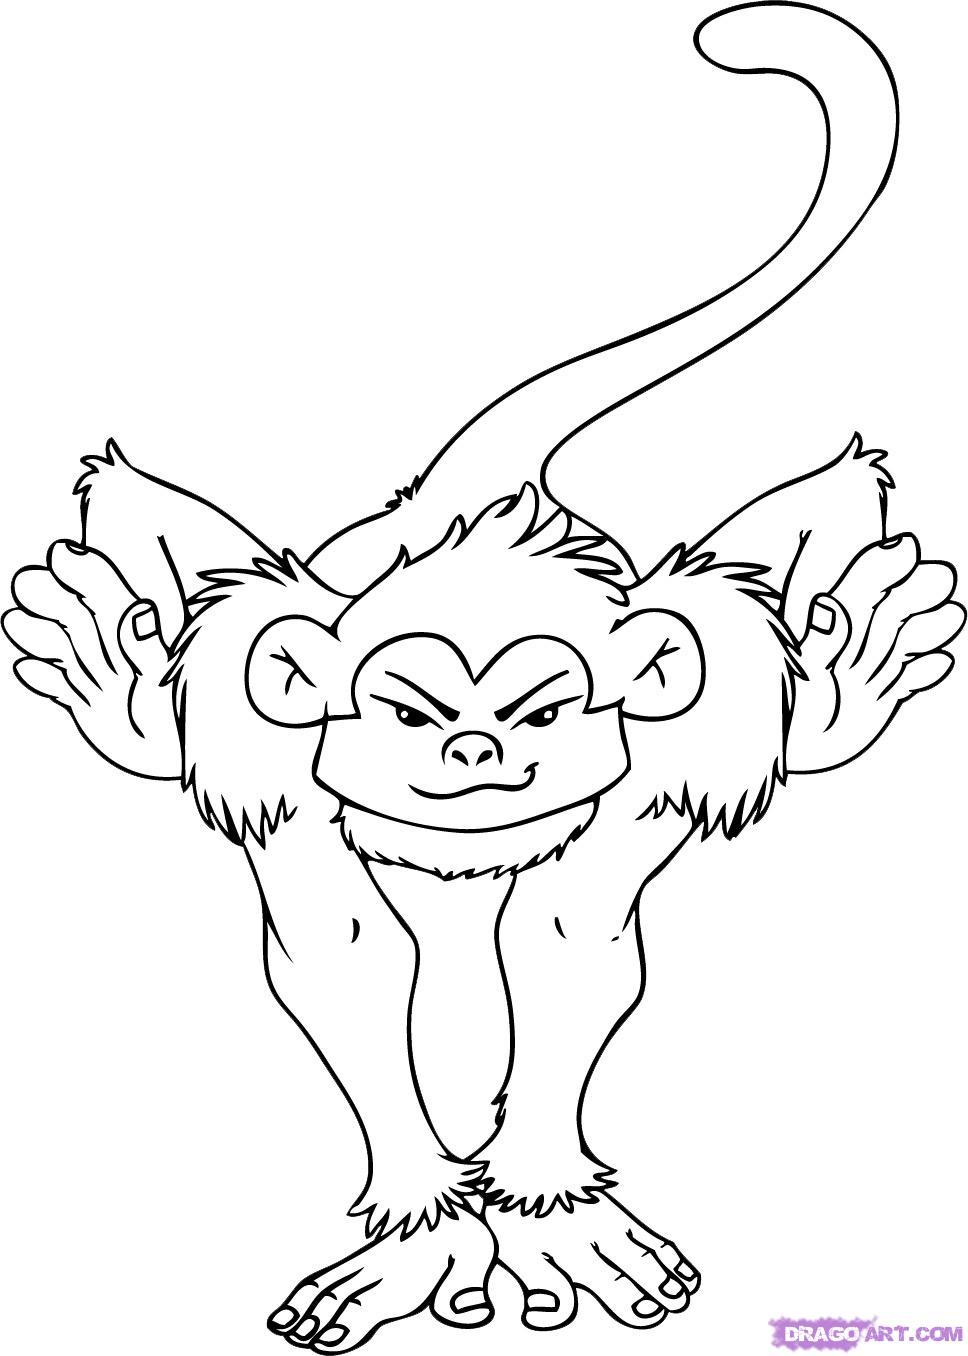 968x1356 Cartoon Monkey Drawing How To Draw A Cartoon Monkey, Step By Step